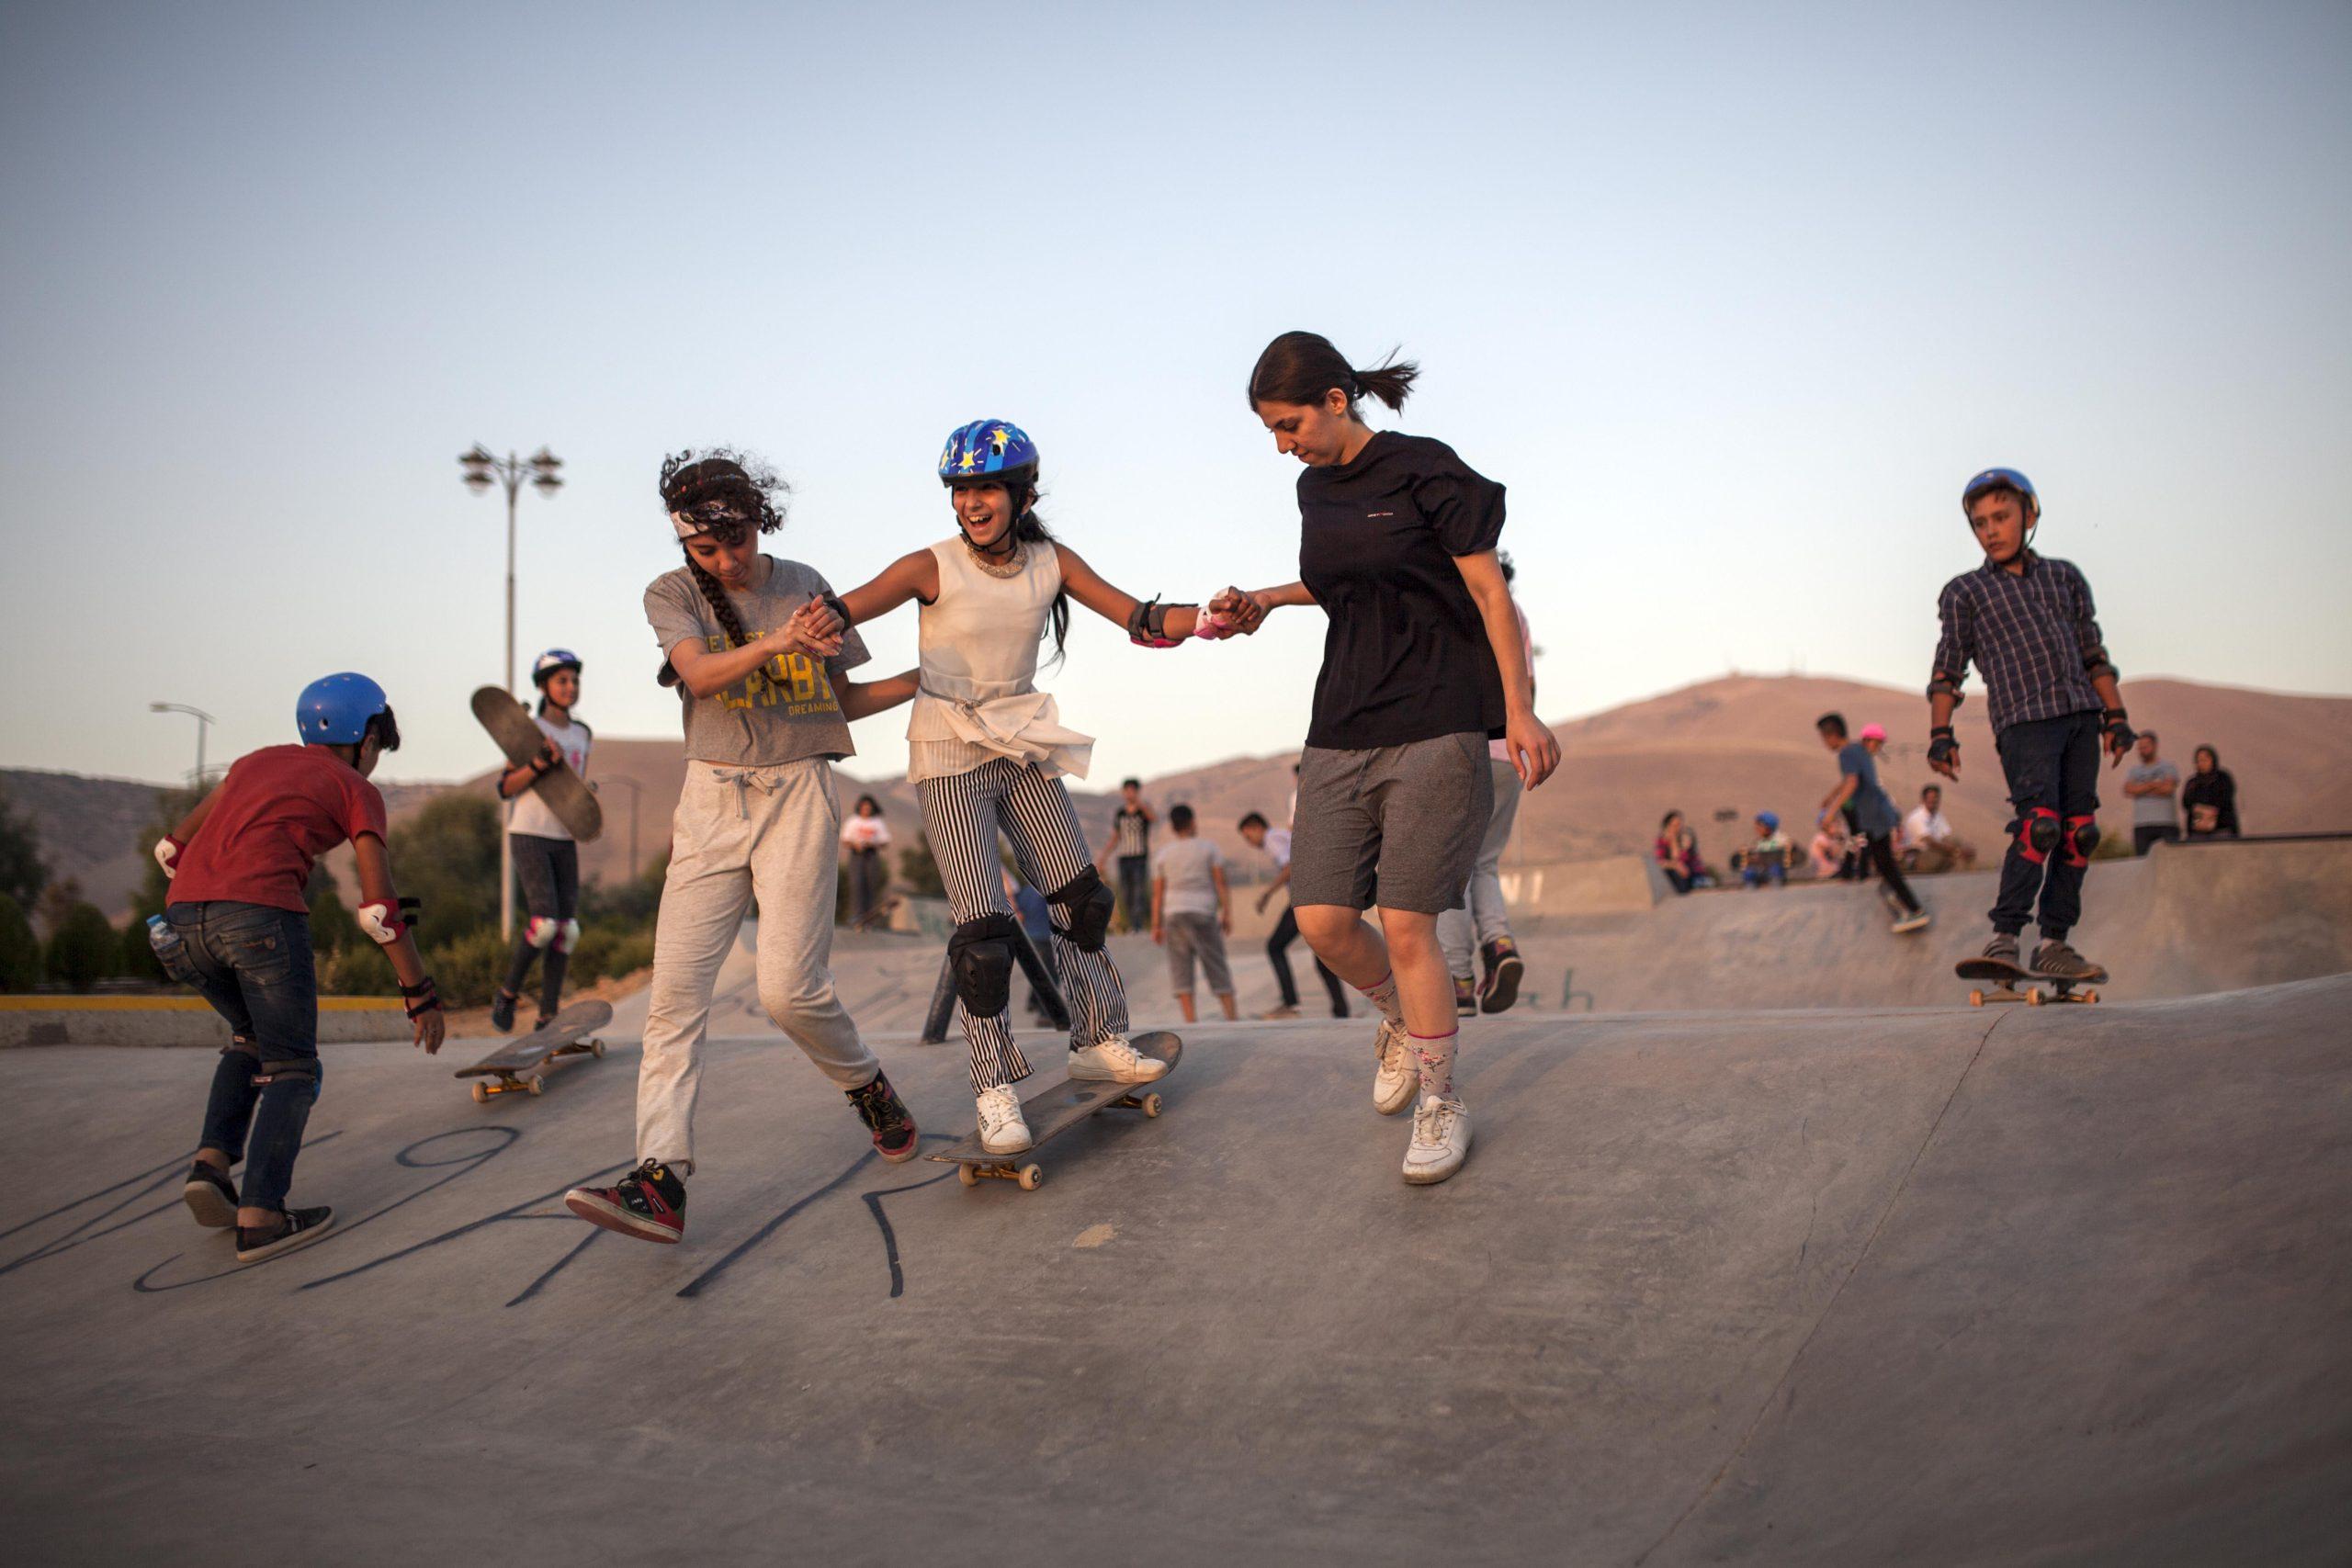 Happy Monday – MLSL Skatepark in Beirut